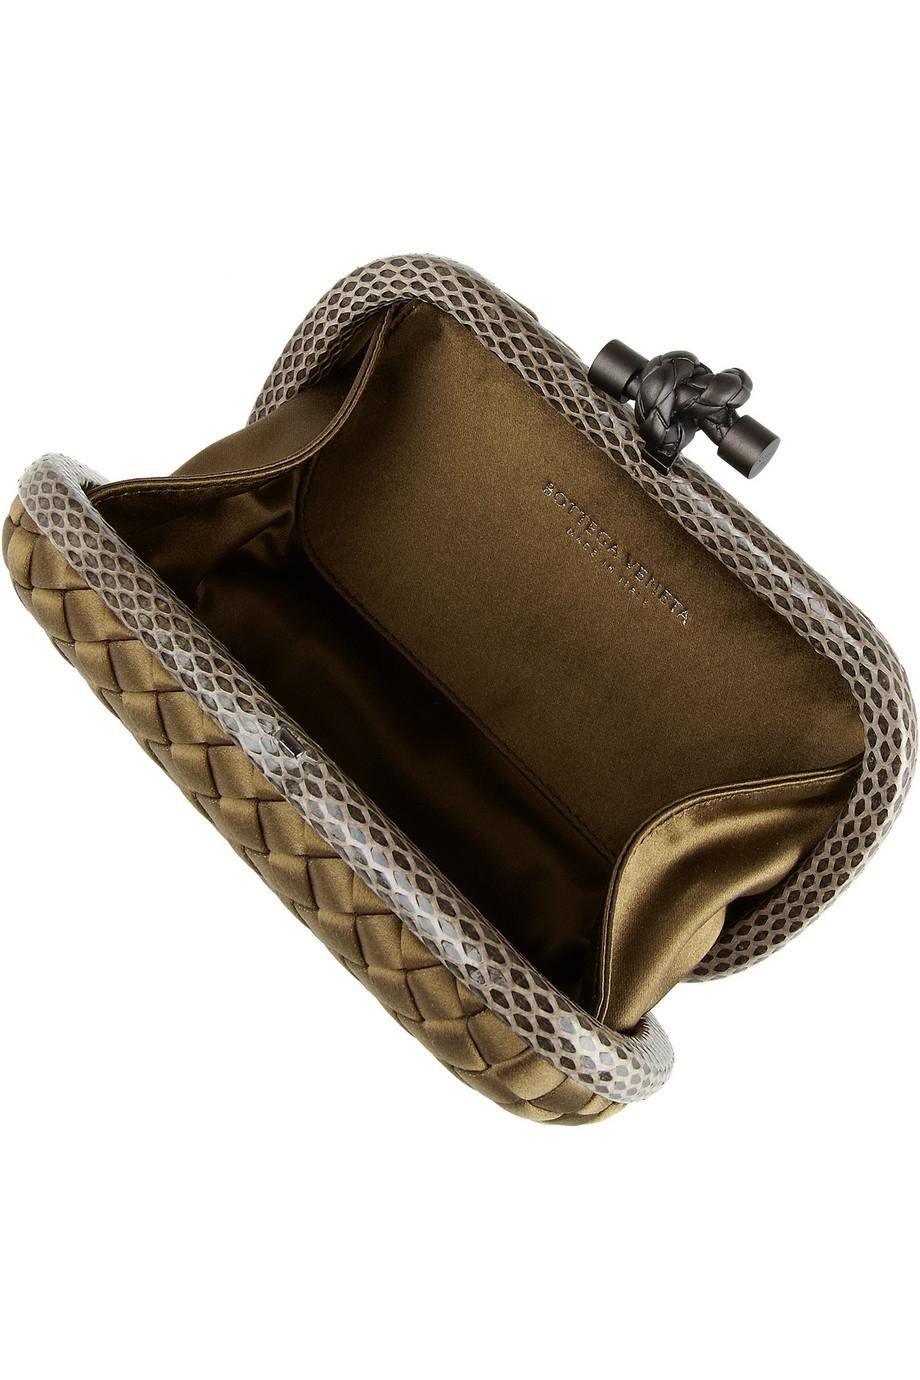 Bottega Veneta Knot Intrecciato Satin Clutch